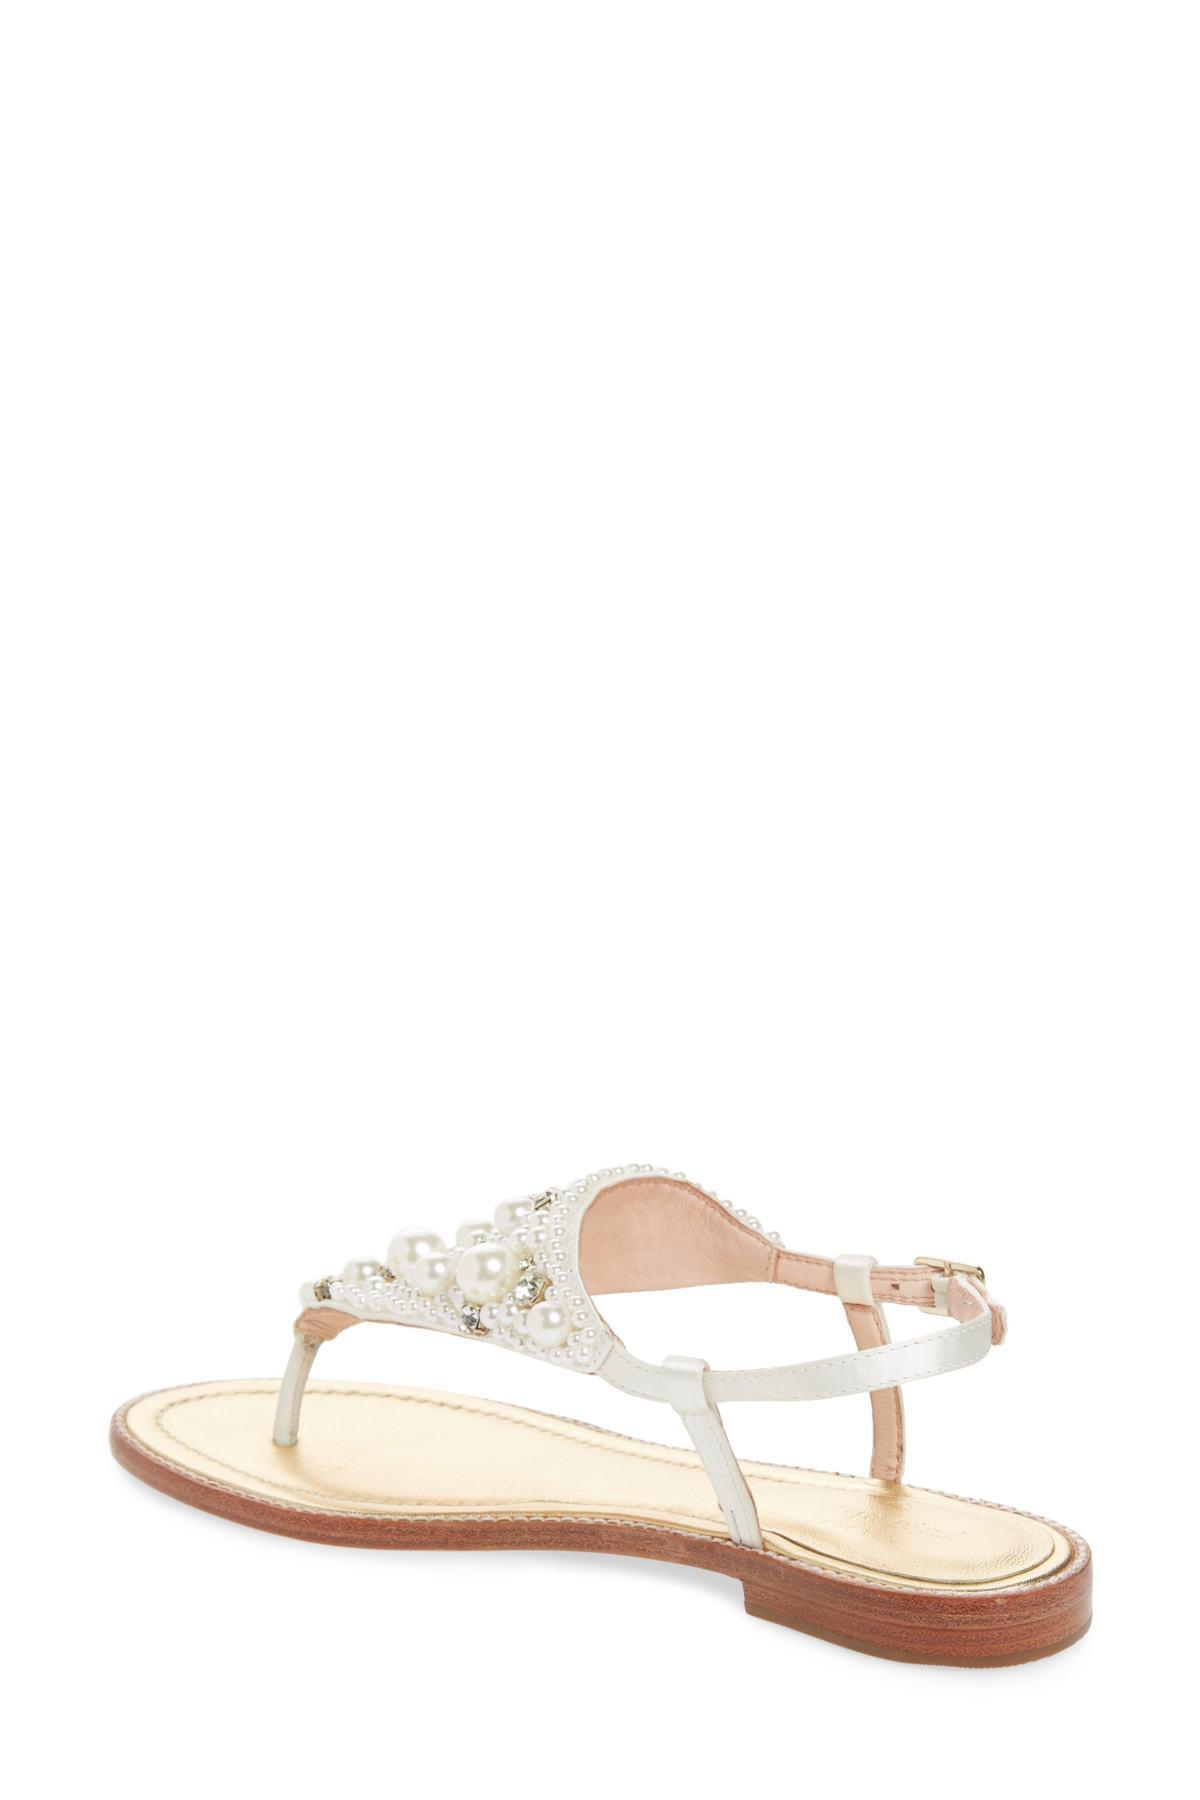 251908355ae4 Lyst - Kate Spade Sama Embellished Thong Sandal (women) in White